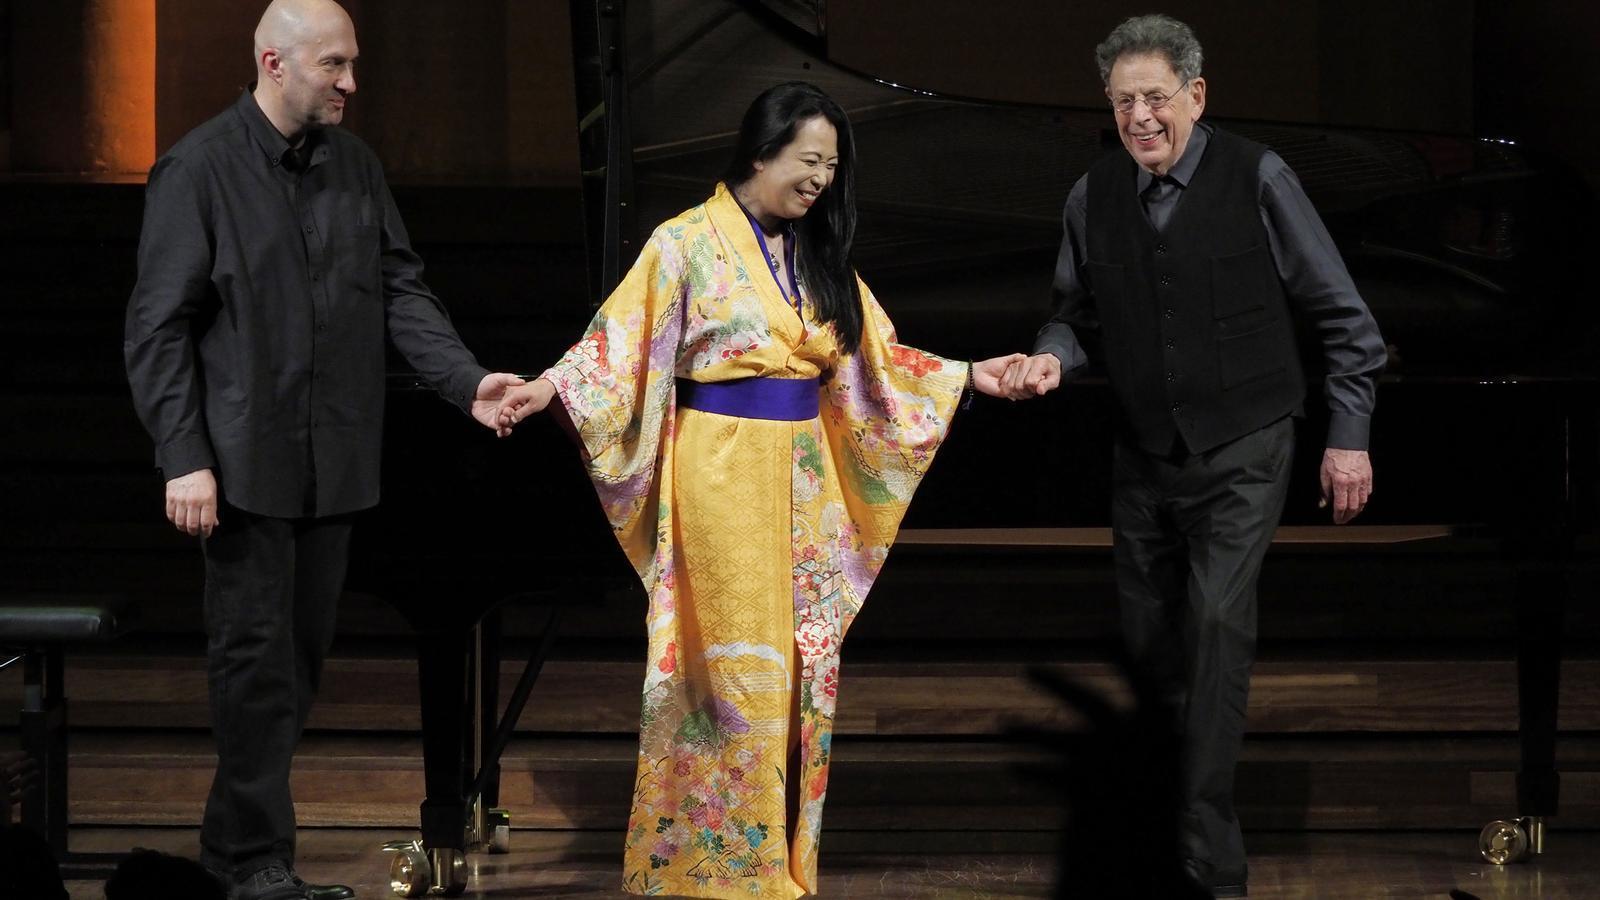 Philip Glass amb Anton Batagov i Maki Namekawa al final del concert